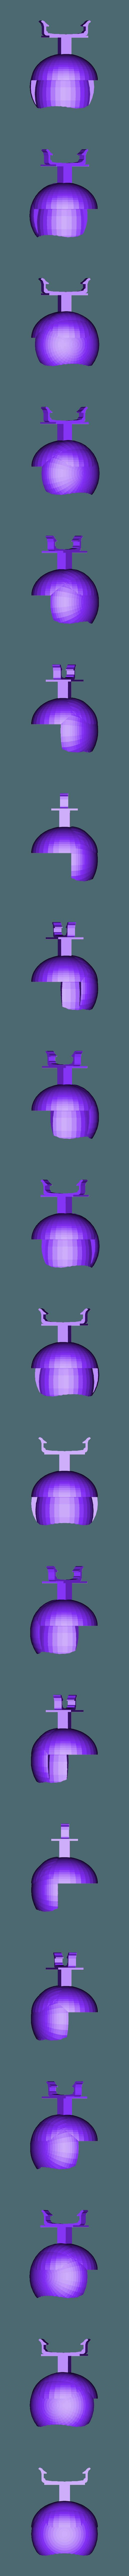 Tello_Egg_Flopper.stl Download STL file Tello Egg Flopper • Object to 3D print, B1nkfish